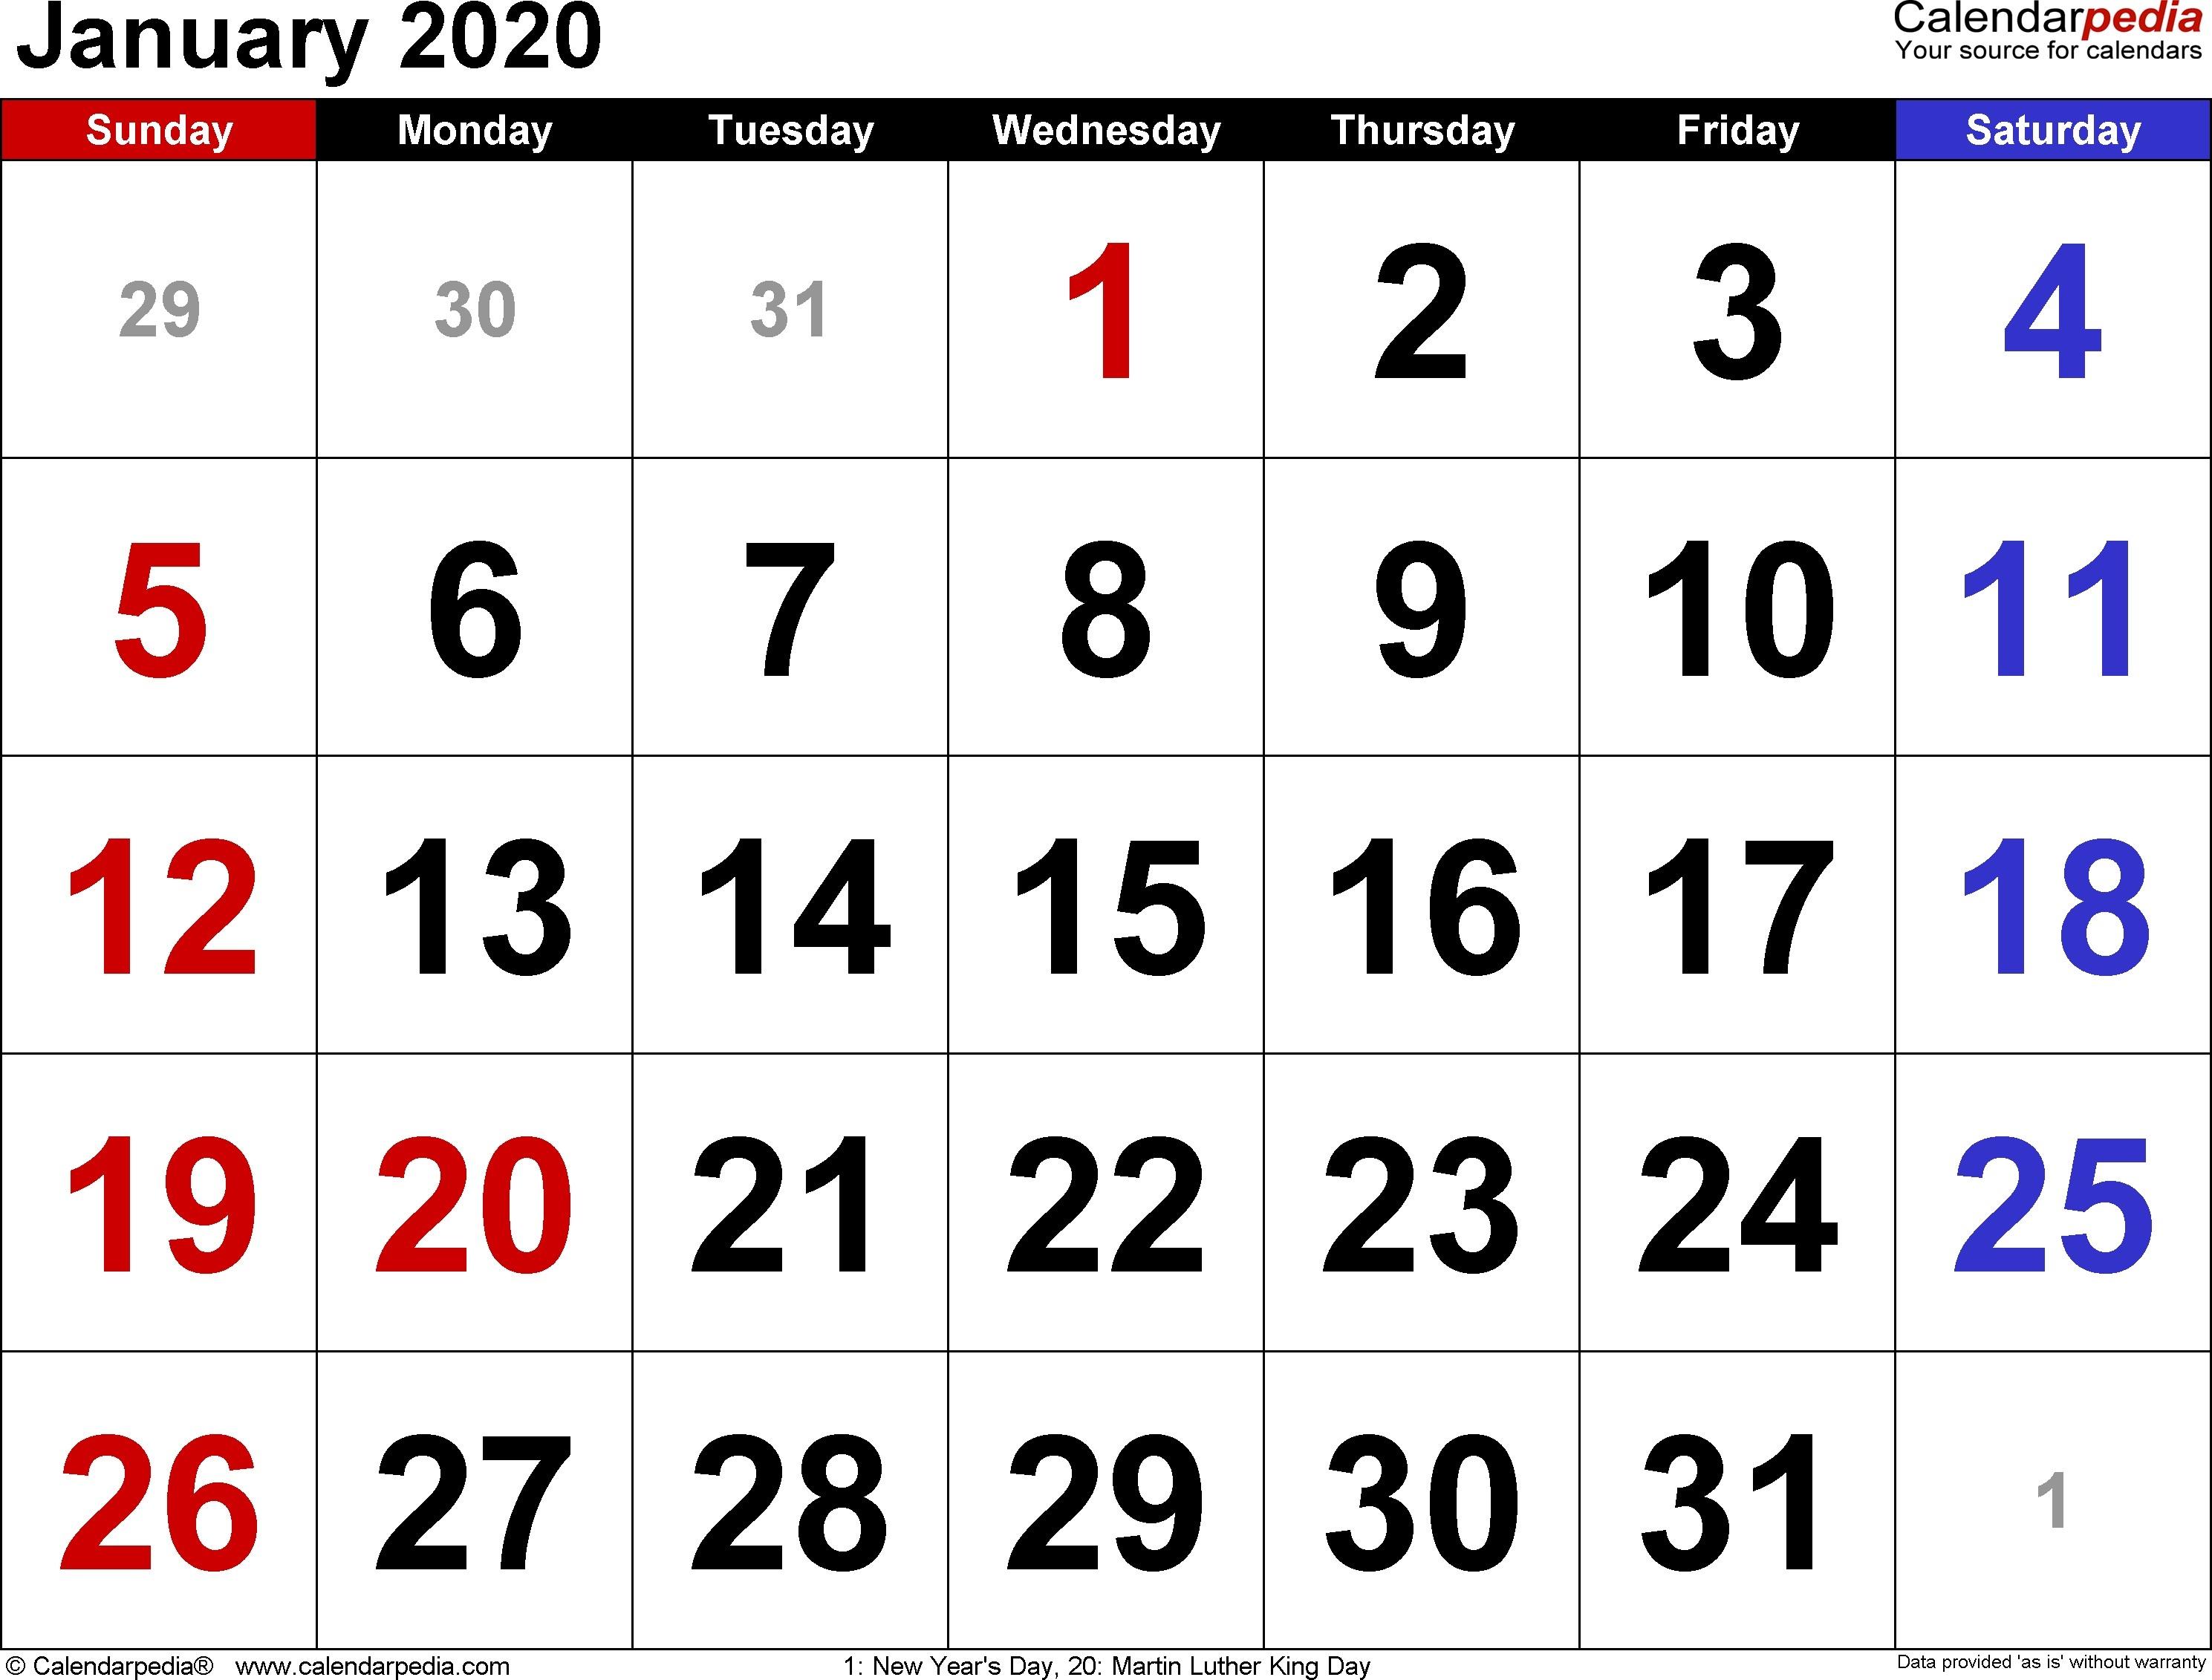 January 2020 Calendar 10 Calendar 2020 January - Calendar-January 2020 Hindu Calendar